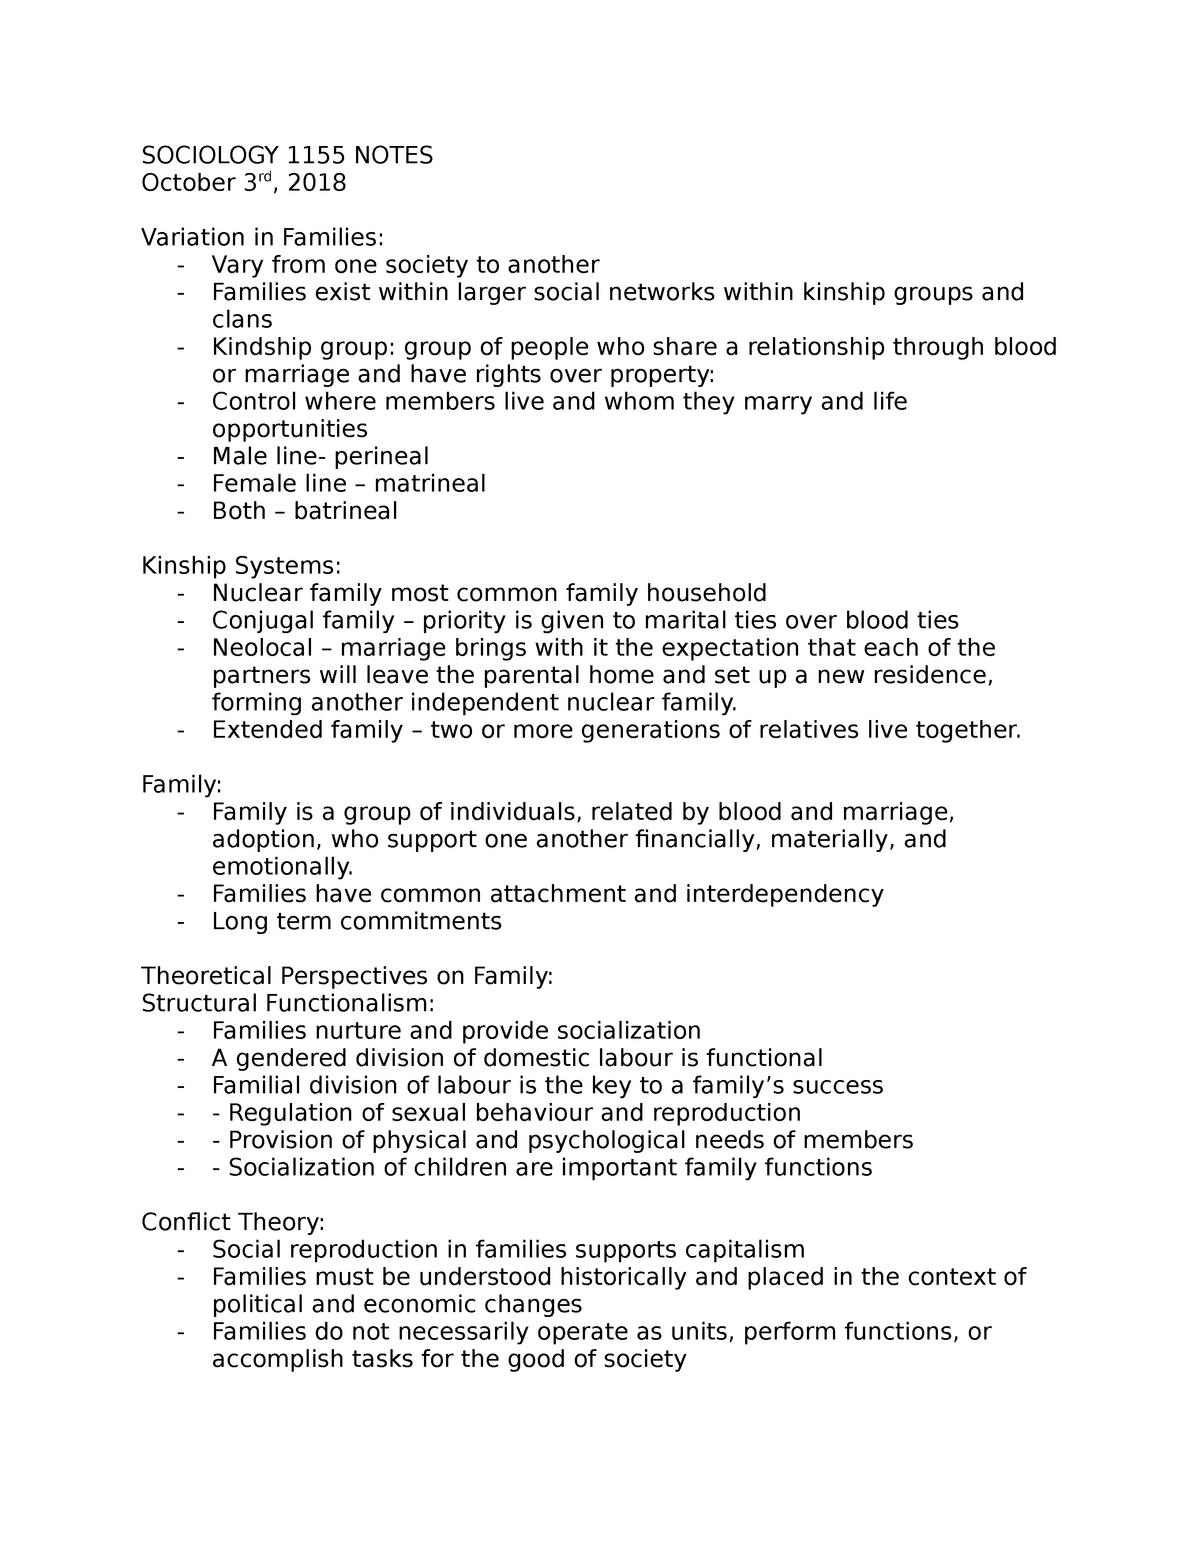 Soci 1155 Notes Week 5 Soci 1155 Social Issues Studocu